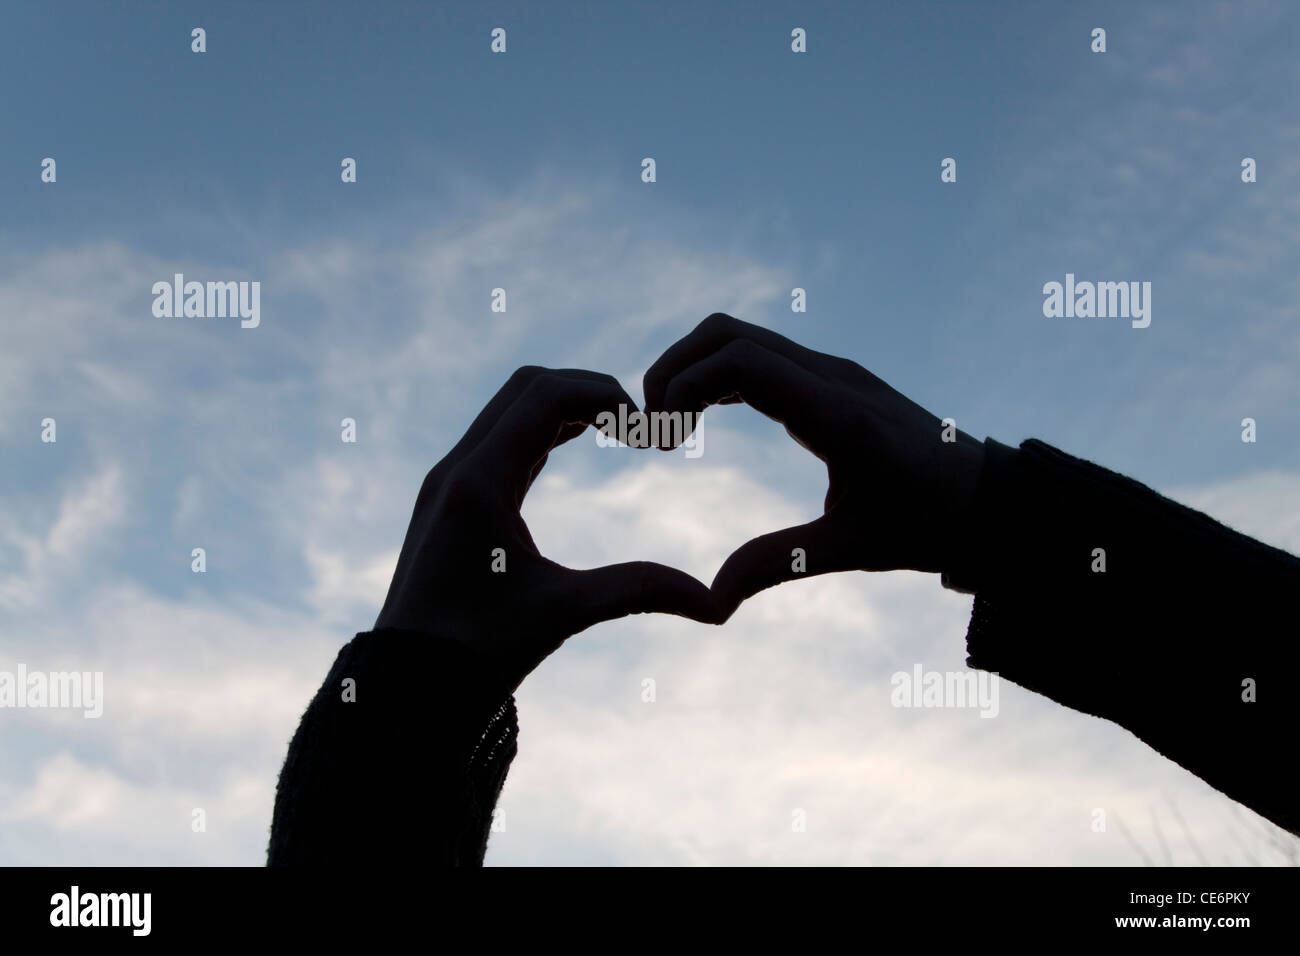 Heart symbol - Stock Image